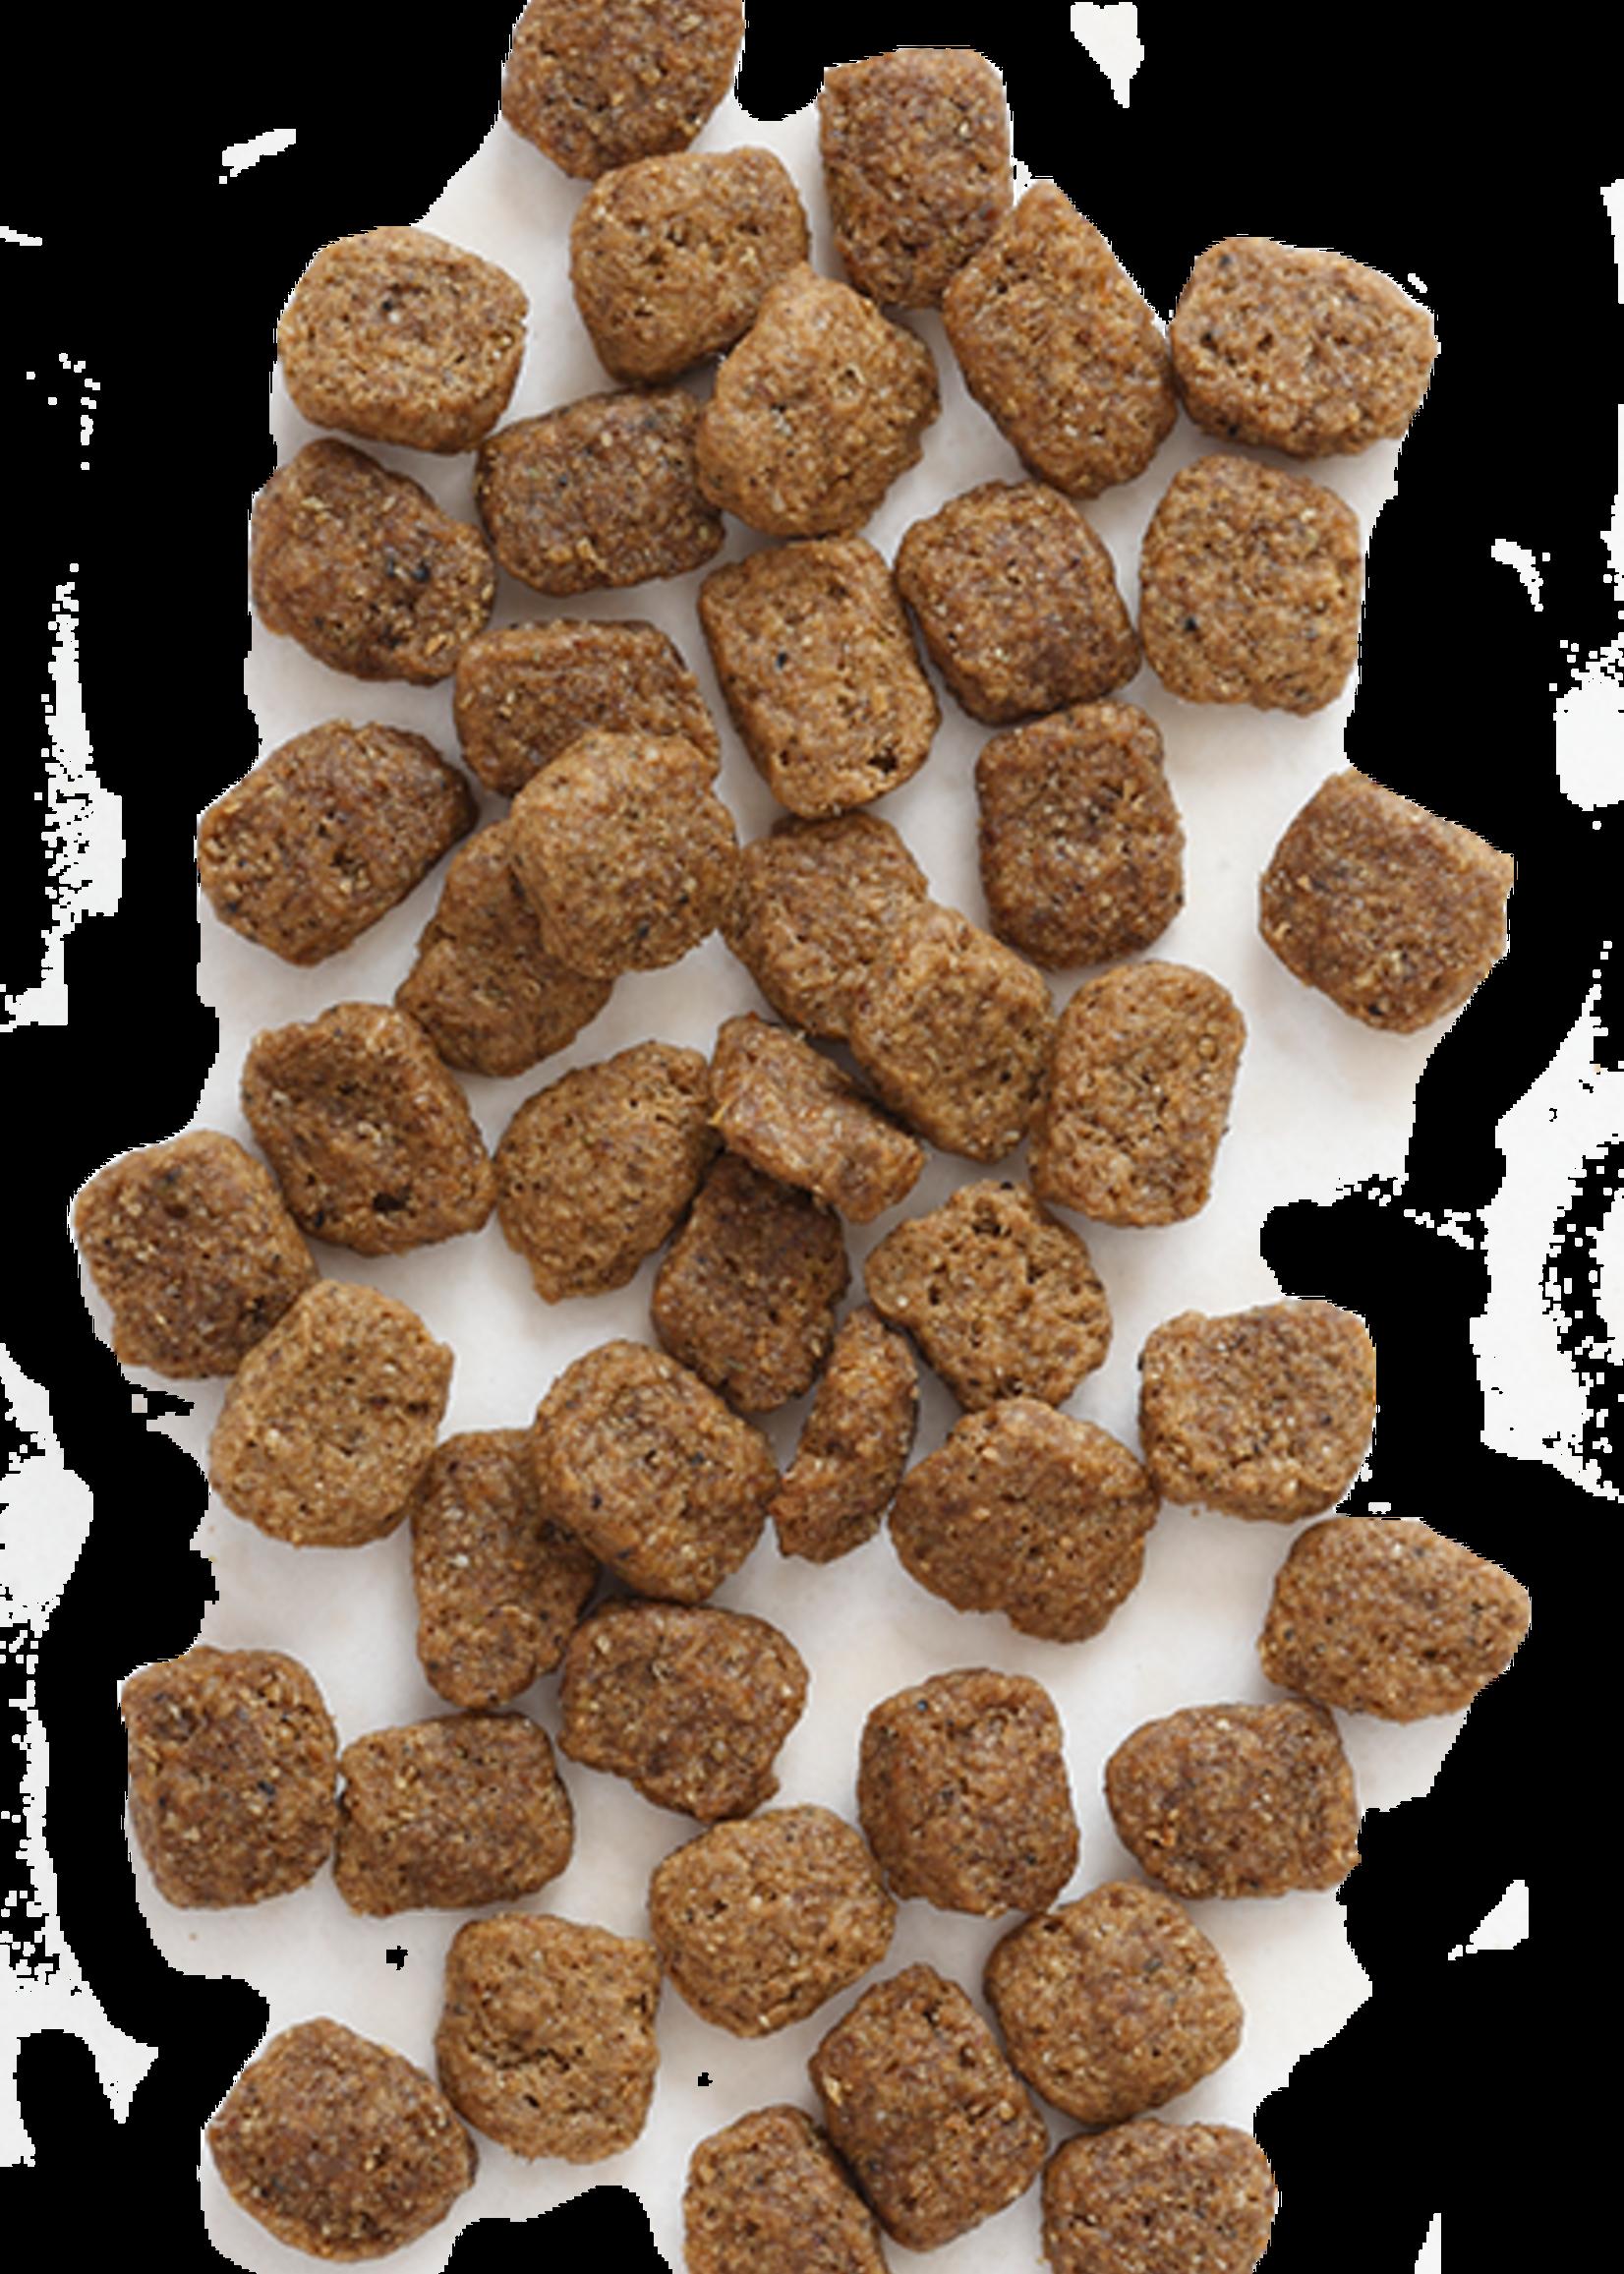 Earthborn by Midwestern Pet Earthborn Dog Dry Holistic Meadow Feast